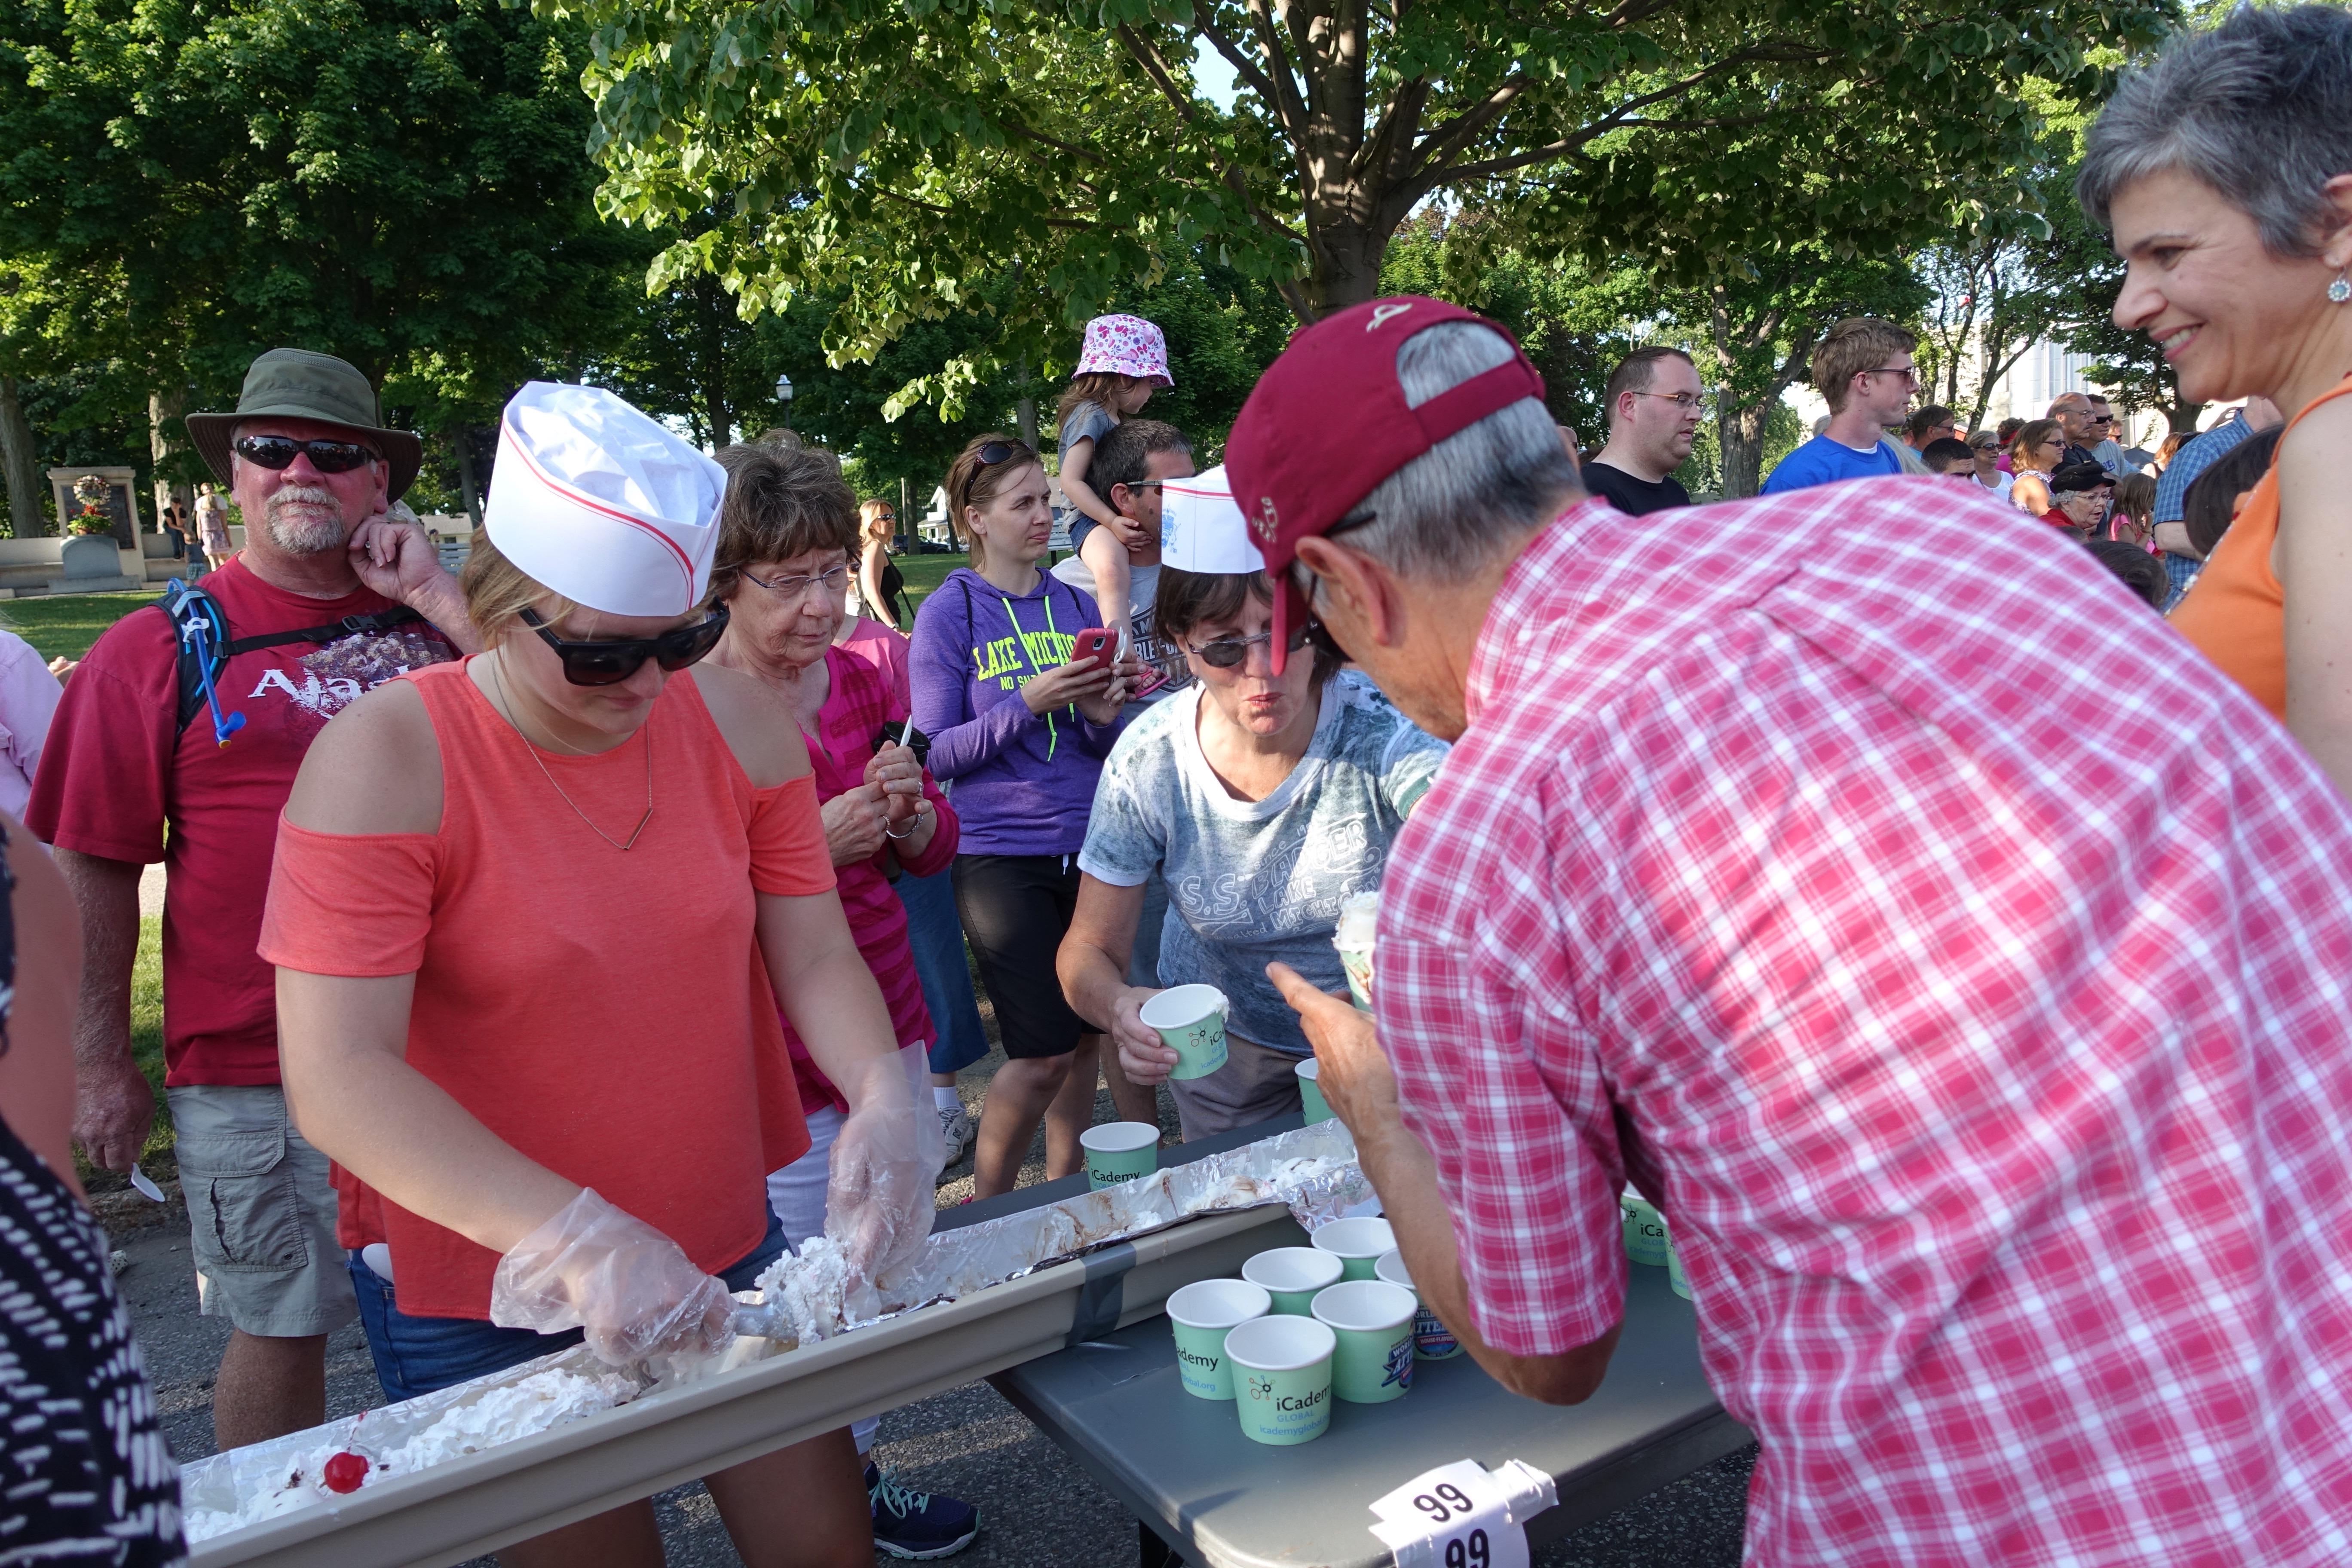 Receiving sundae Kathi eating sundae at Ludington's World's Largest Sundae Attempt